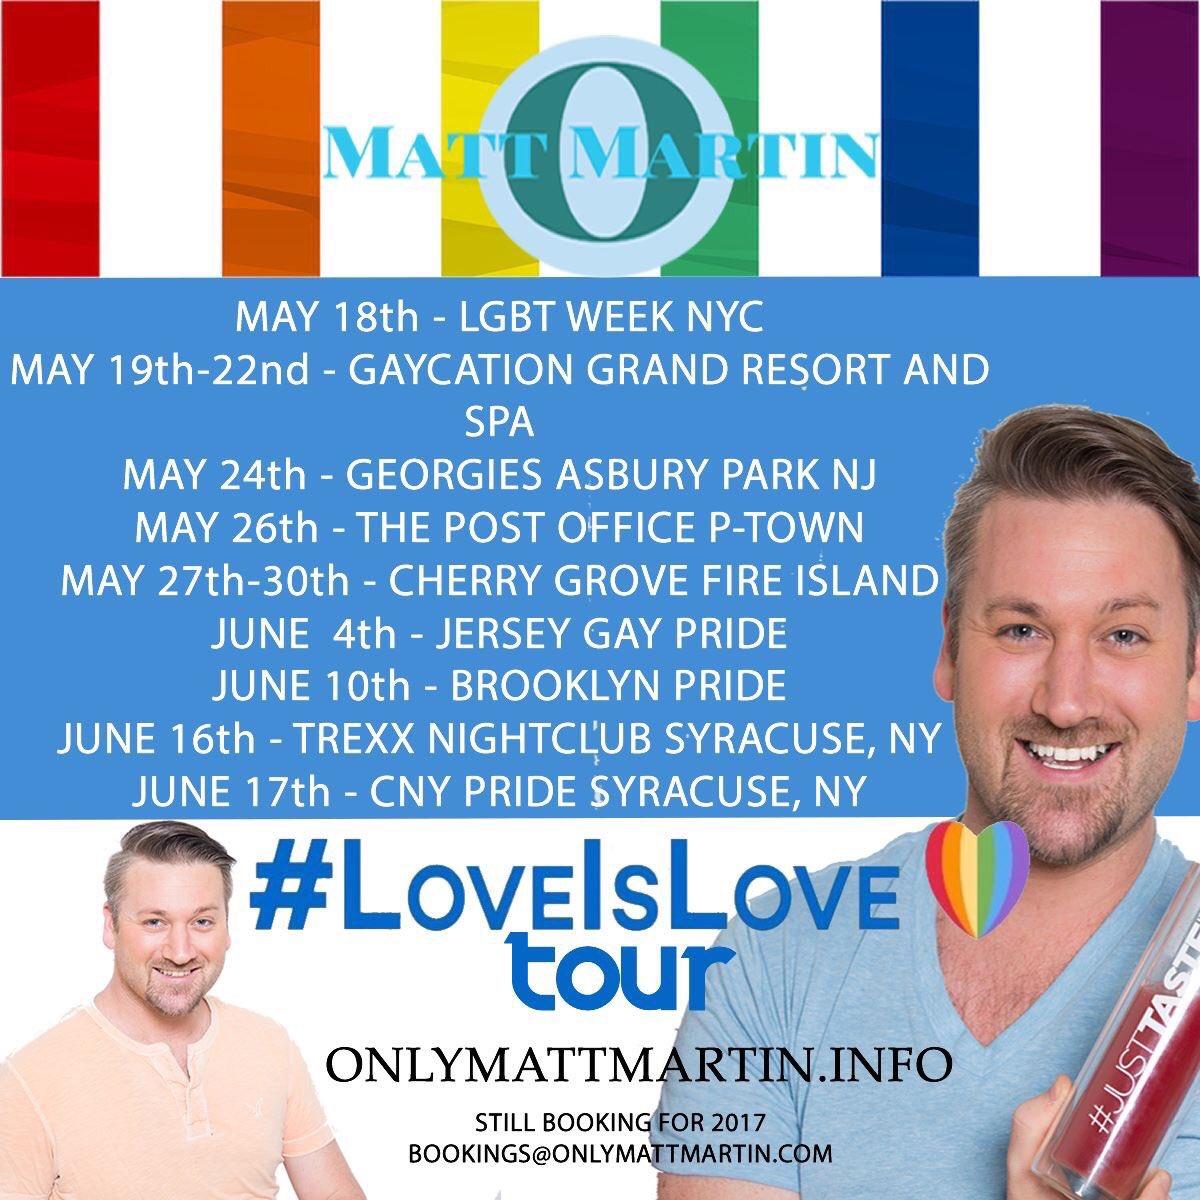 Happy #Pride2017 ! My #LoveIsLove Tour continues this weekend @JerseyPrideInc https://t.co/jvrhaJ8pUk https://t.co/pHQzvkcy5q